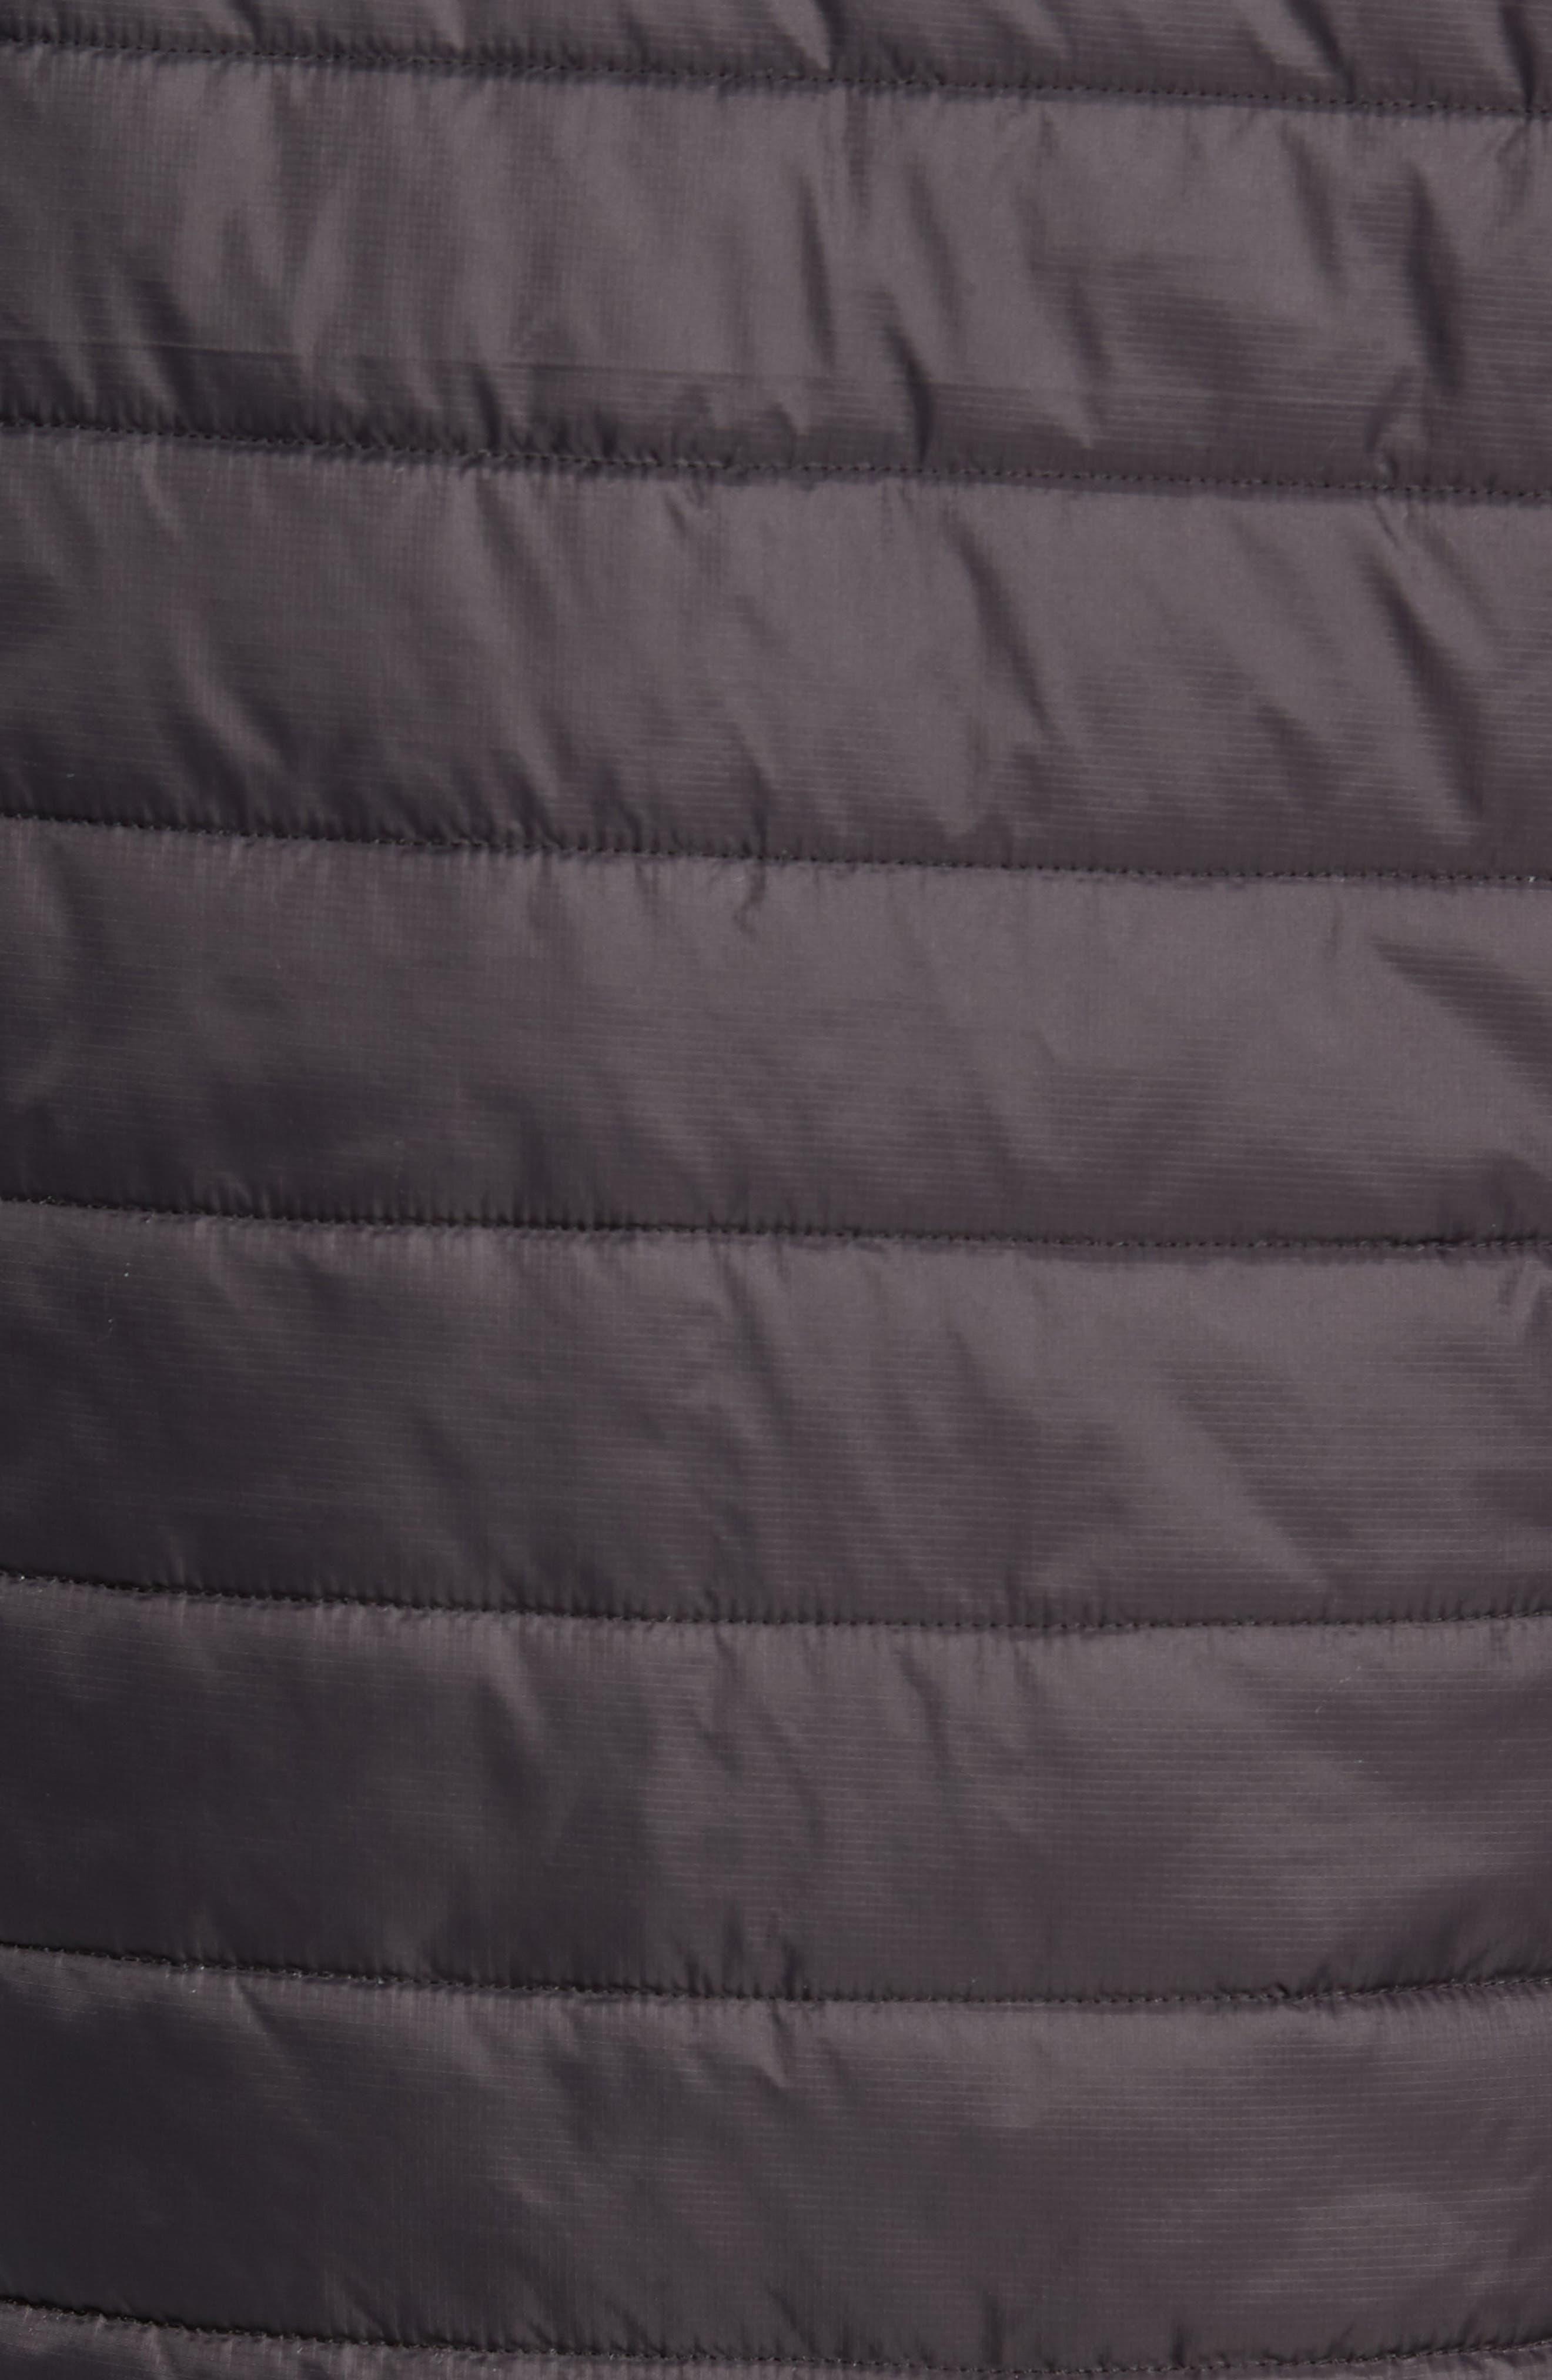 VINEYARD VINES,                             Regular Fit Down Mountain Vest,                             Alternate thumbnail 7, color,                             002